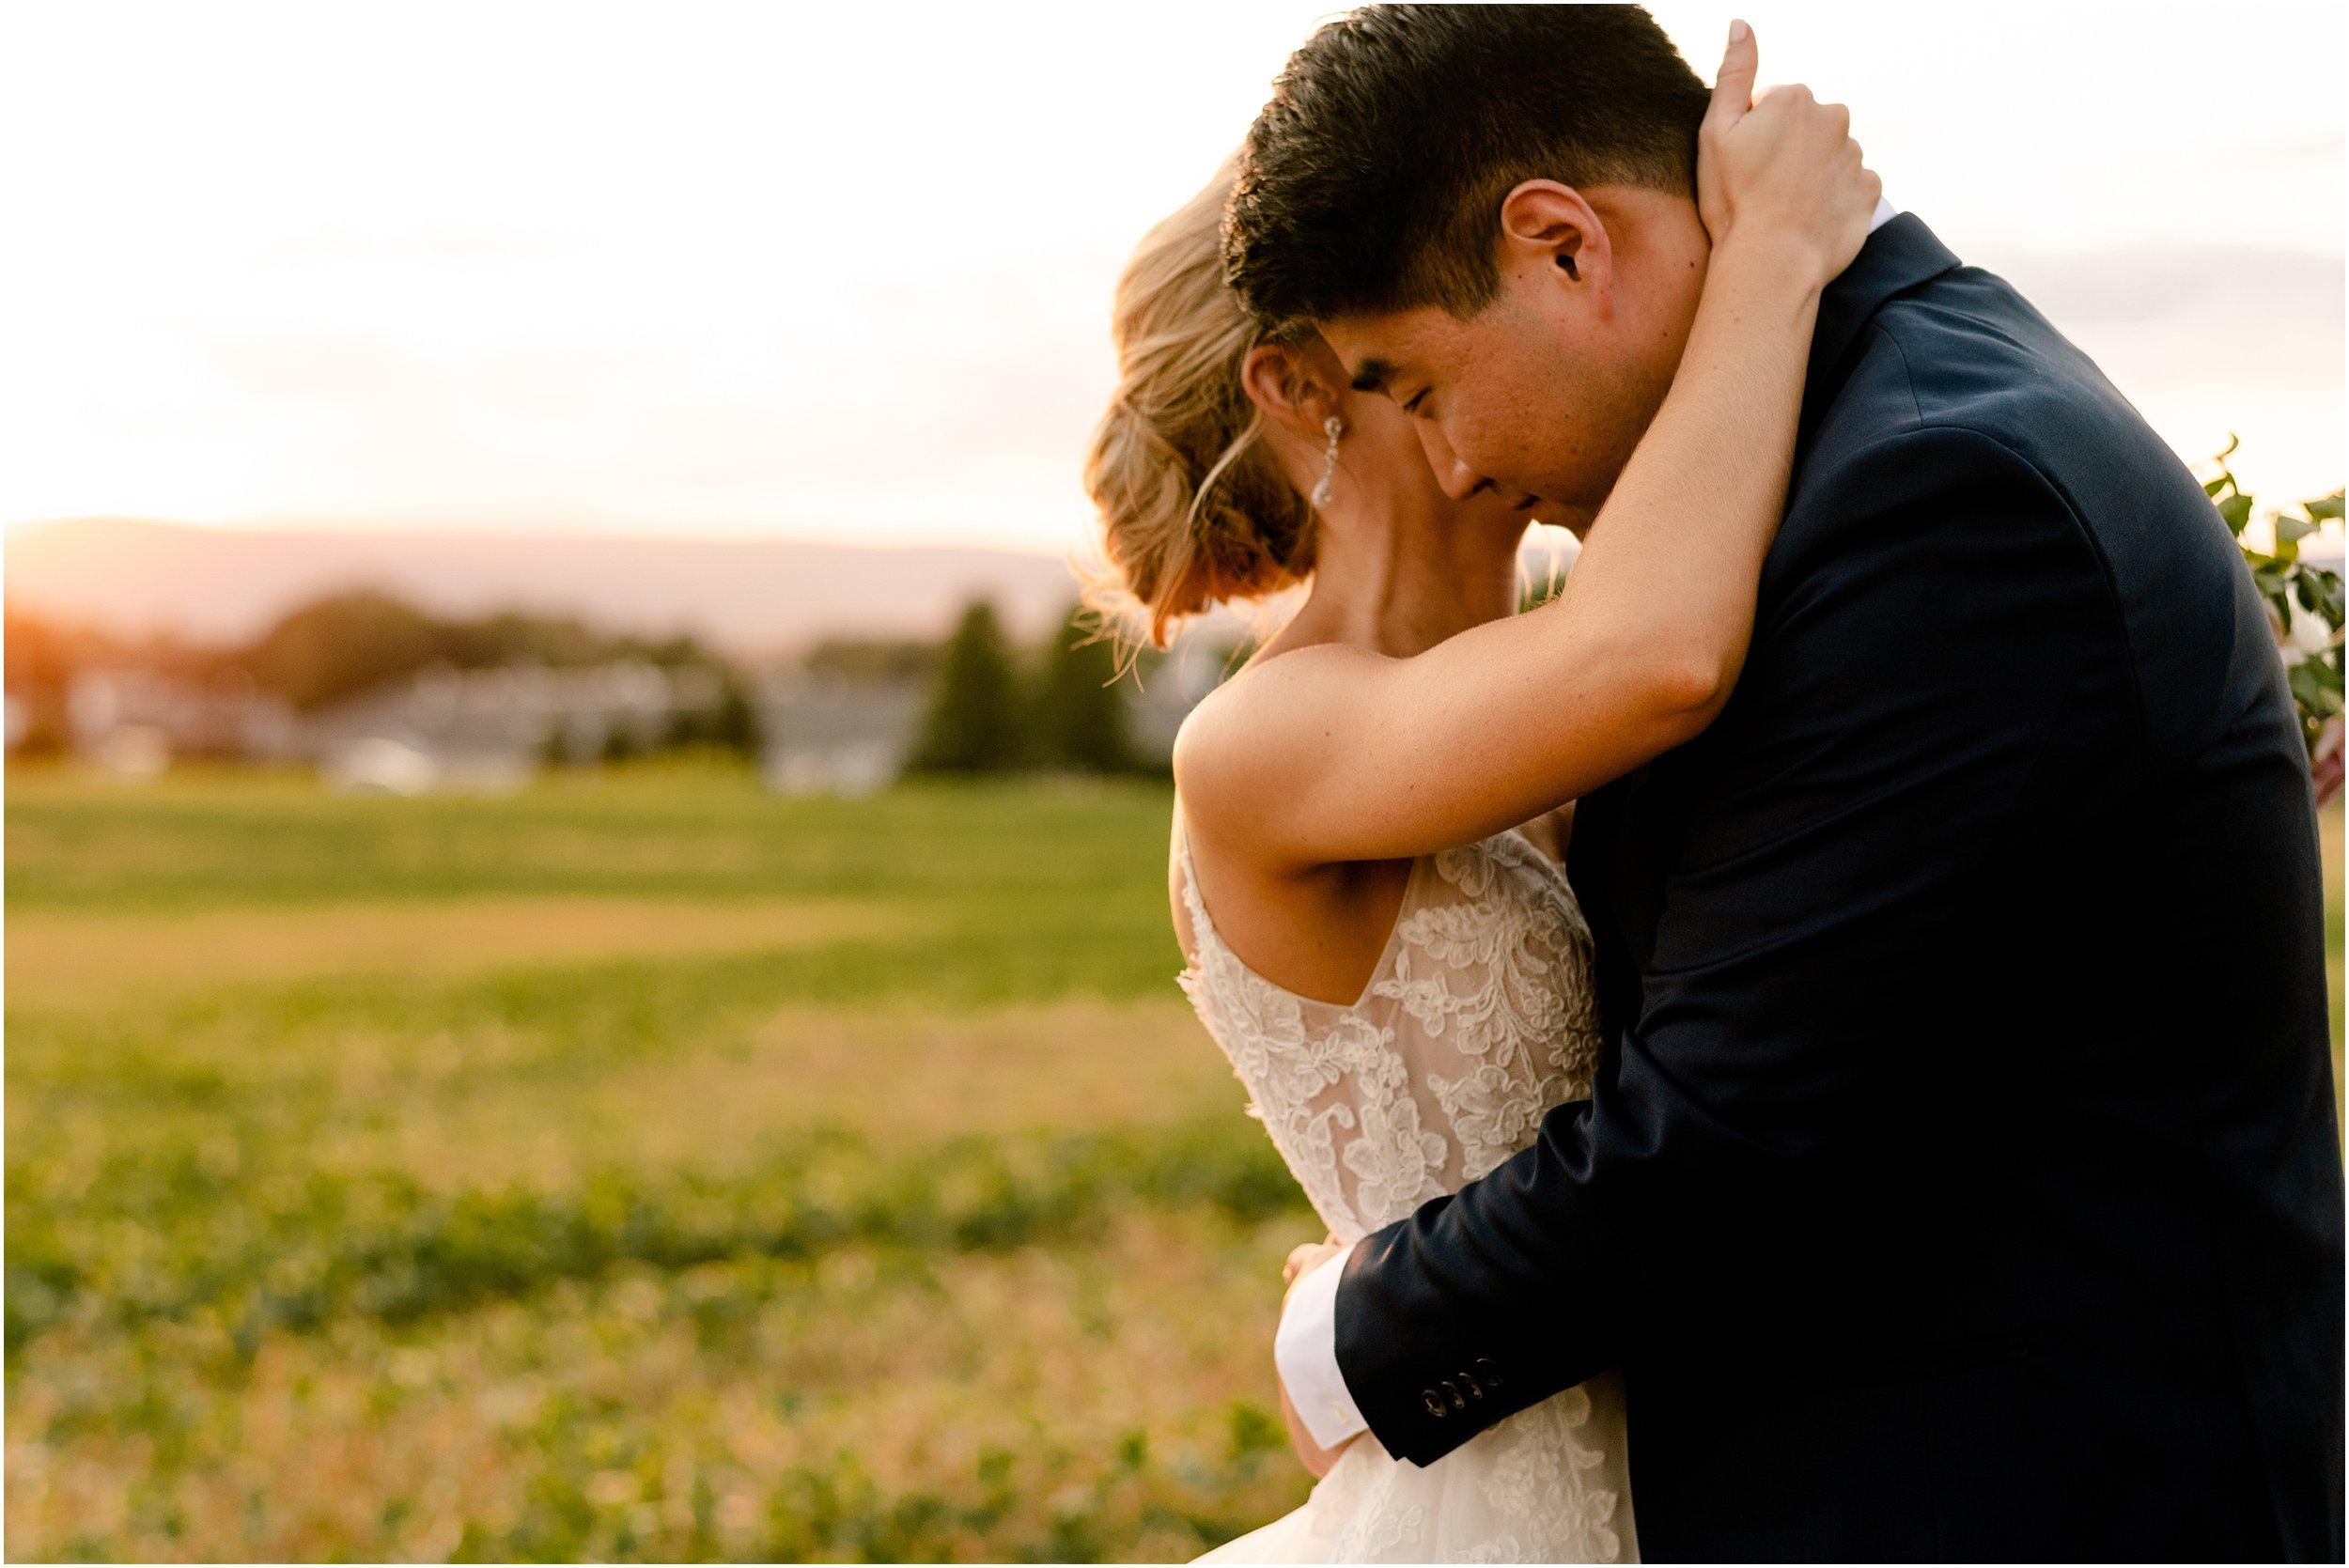 hannah leigh photography Walkers Overlook Wedding Walkersville MD_3564.jpg